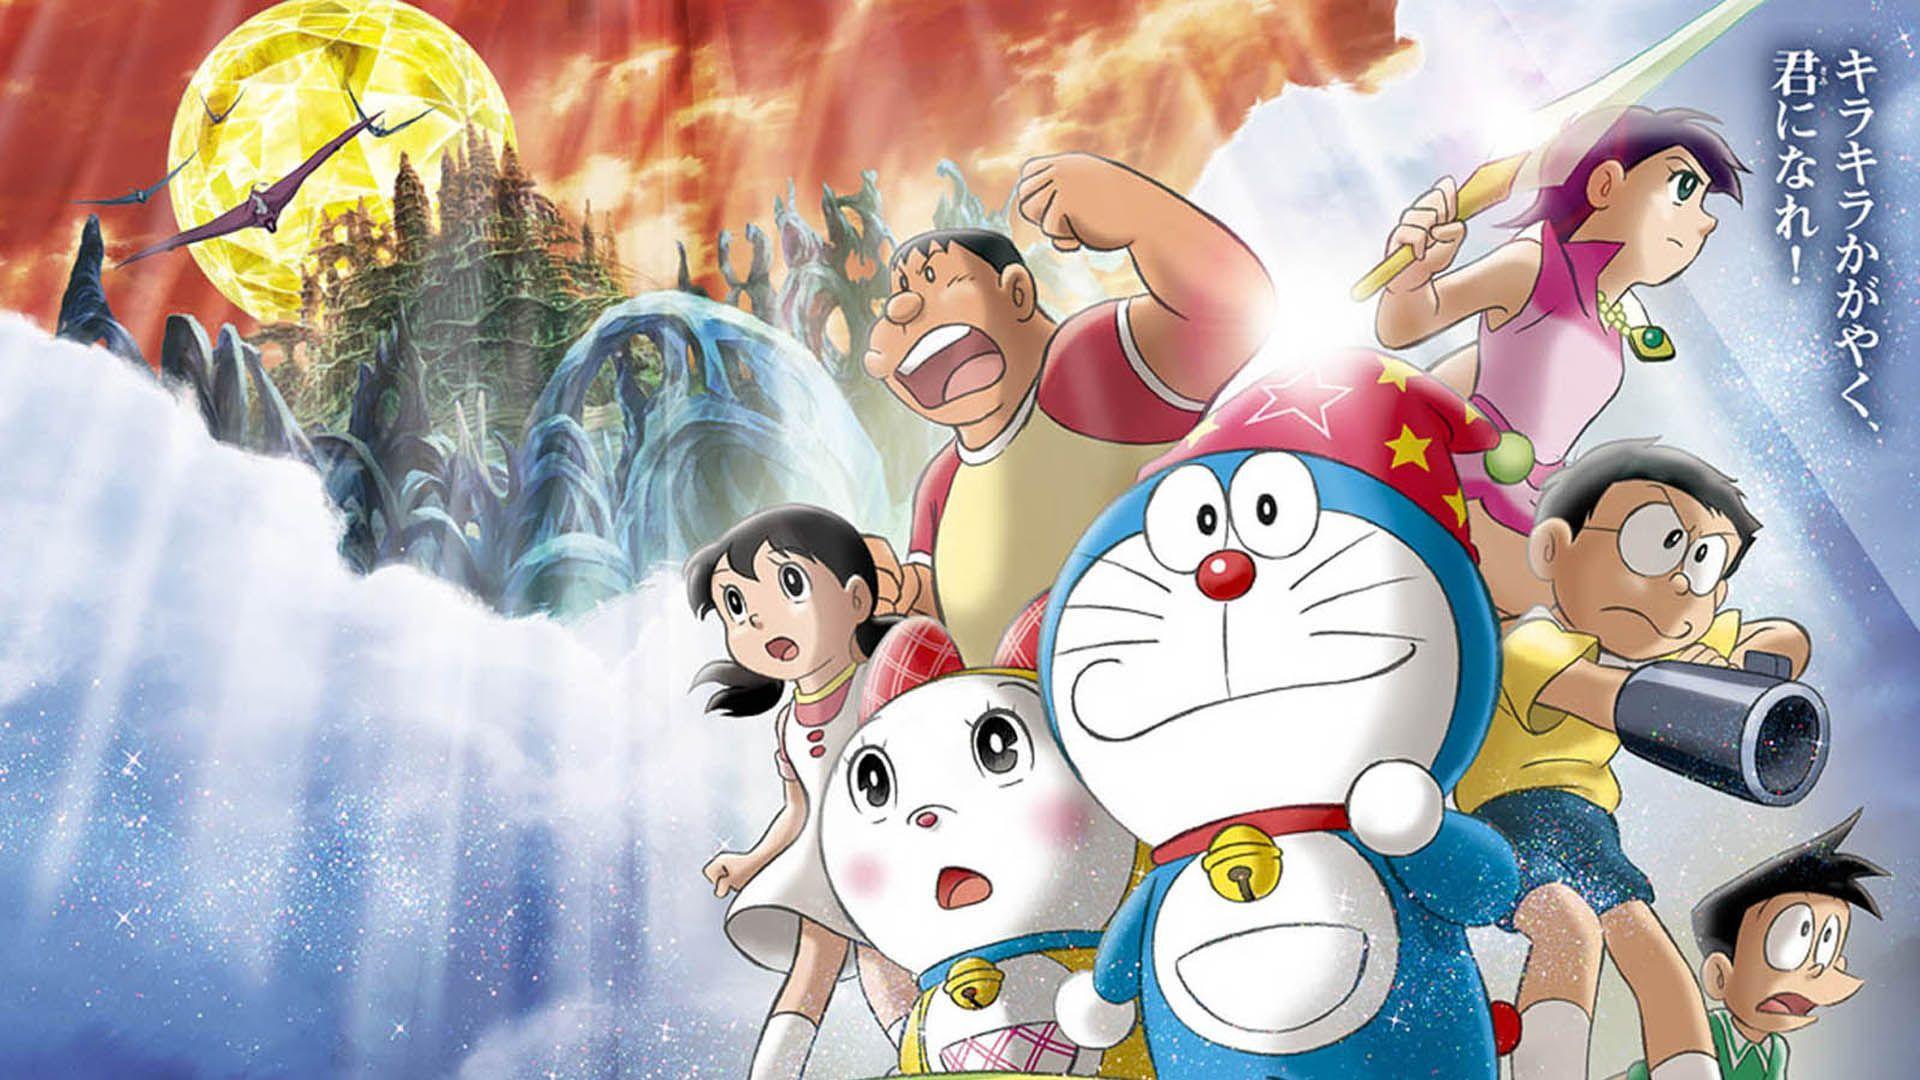 Wallpaper Doraemon Cartoon Photo Free Download Doraemon Backgrounds Pixelstalk Net Doraemon Cartoon In 2020 Doraemon Wallpapers Doraemon Cartoon Cartoon Wallpaper Hd